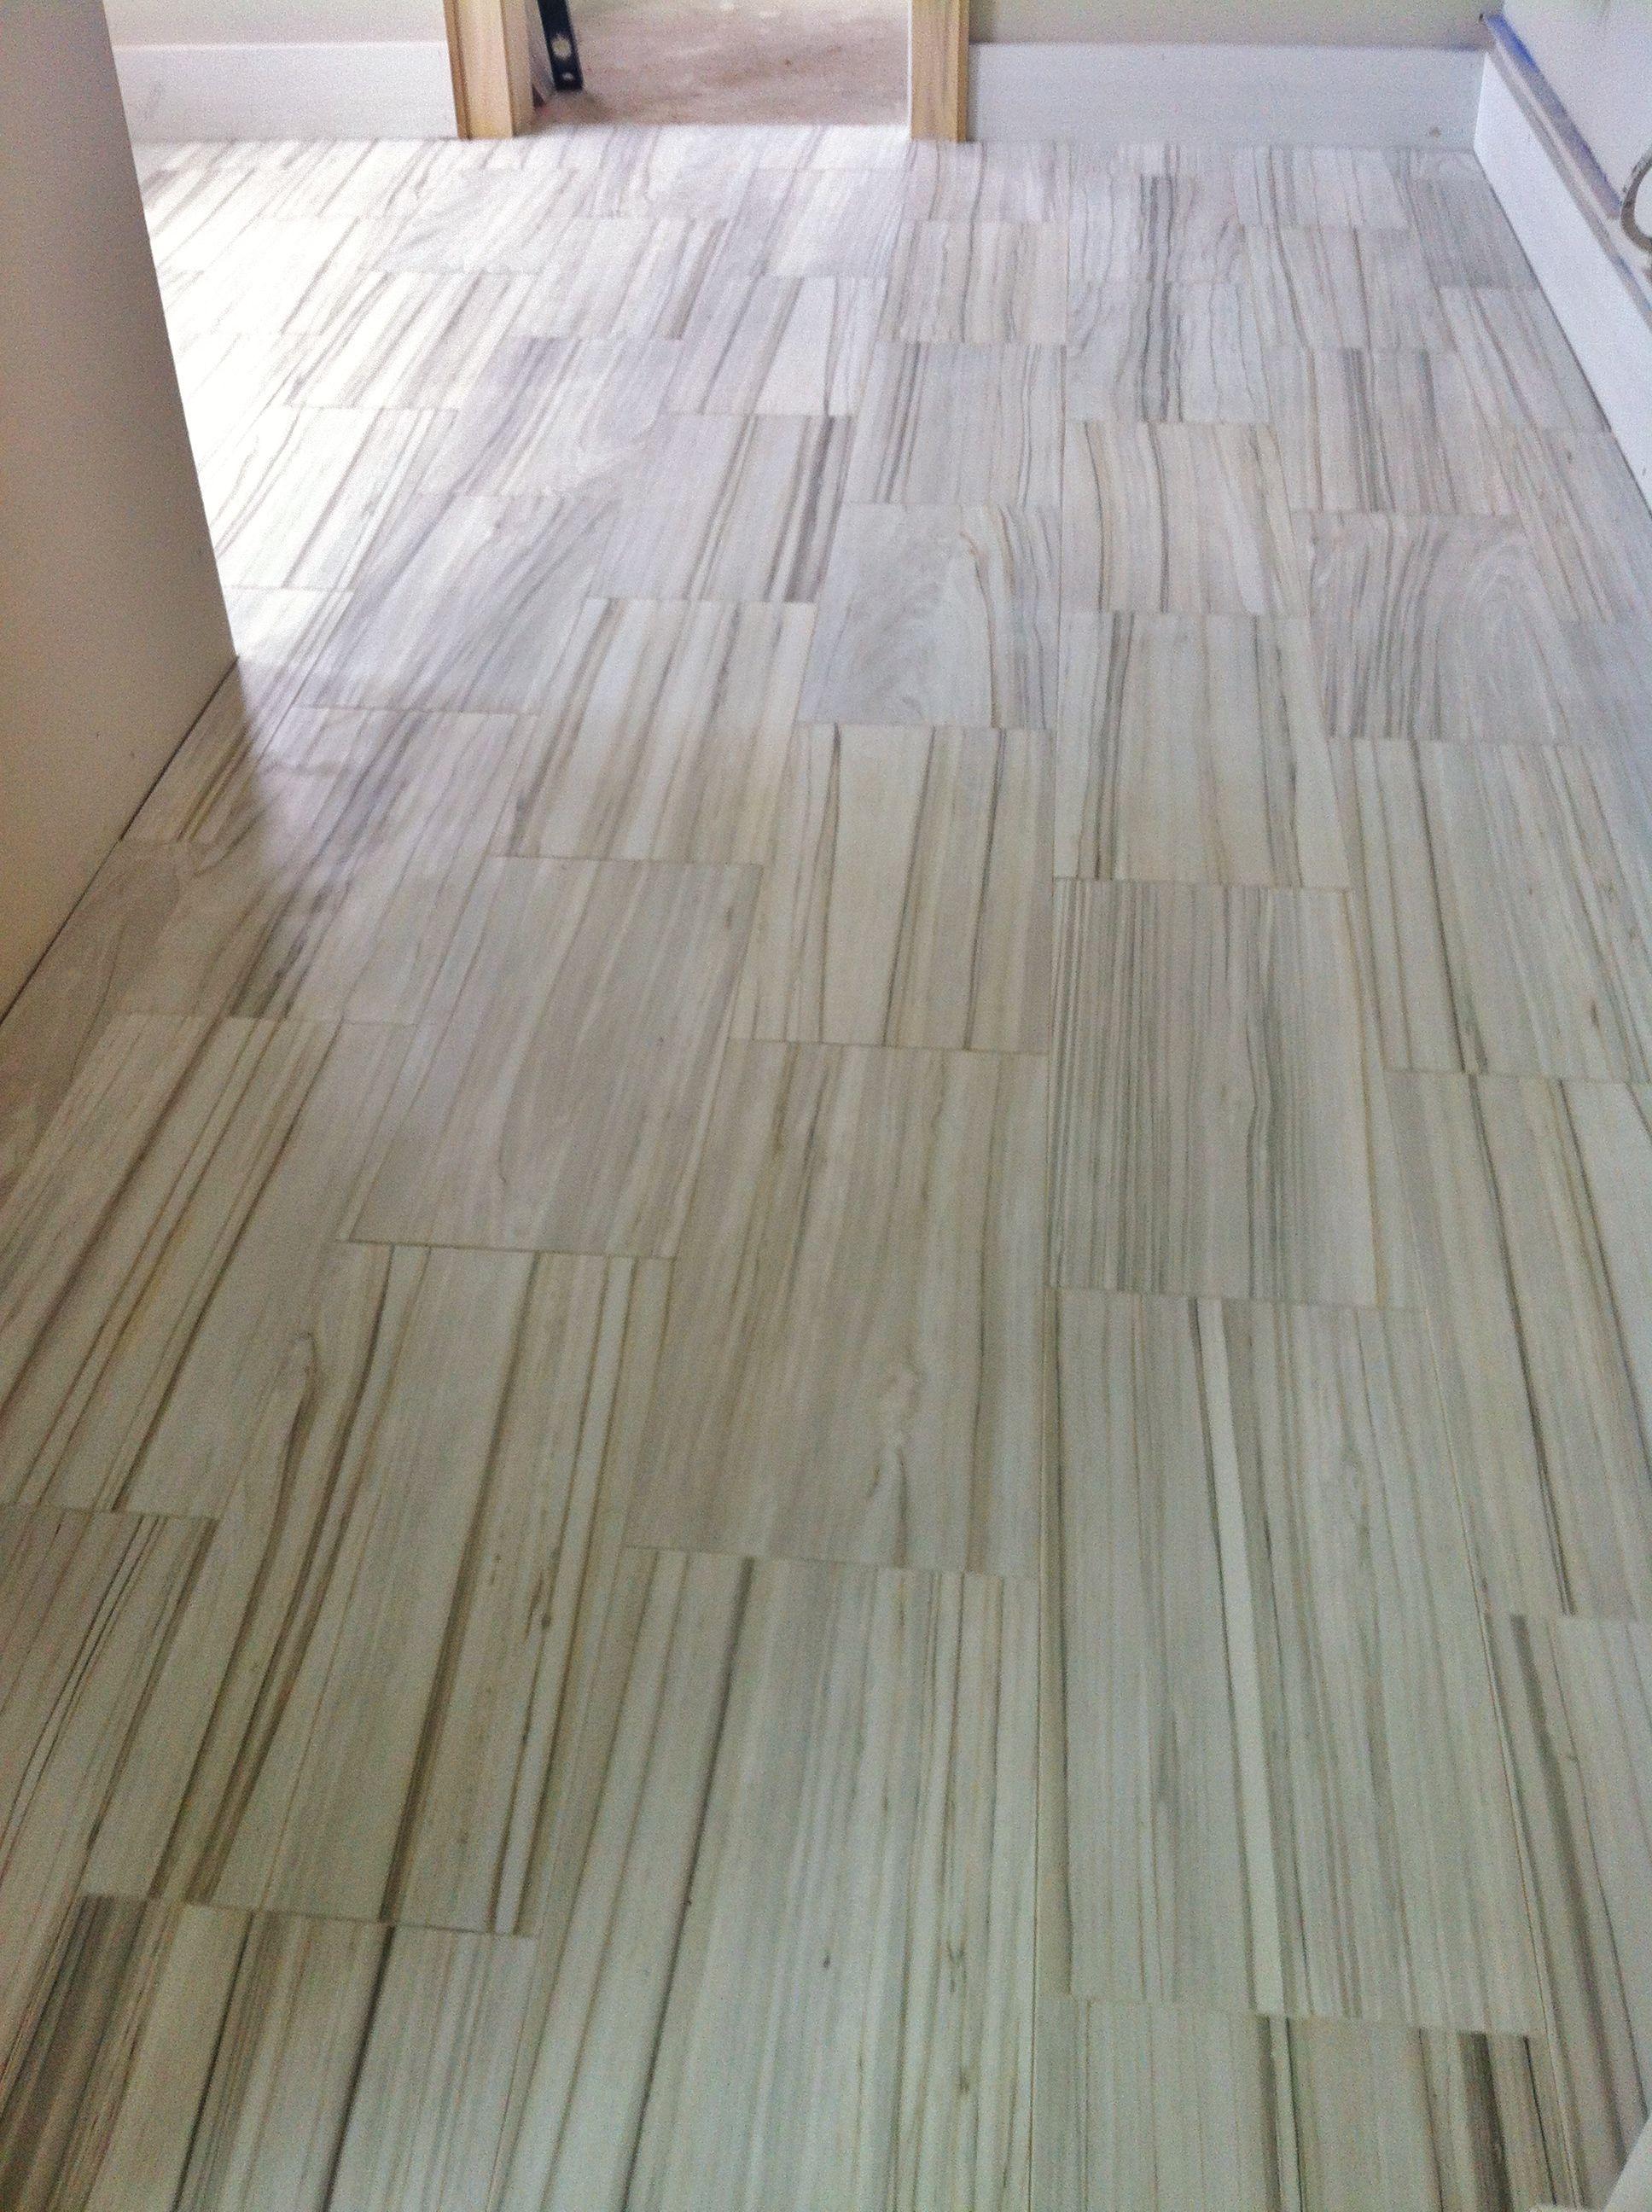 12x24 striated porcelain tile on bathroom floor someone did this 12x24 striated porcelain tile on bathroom floor someone did this lovely floor dailygadgetfo Images